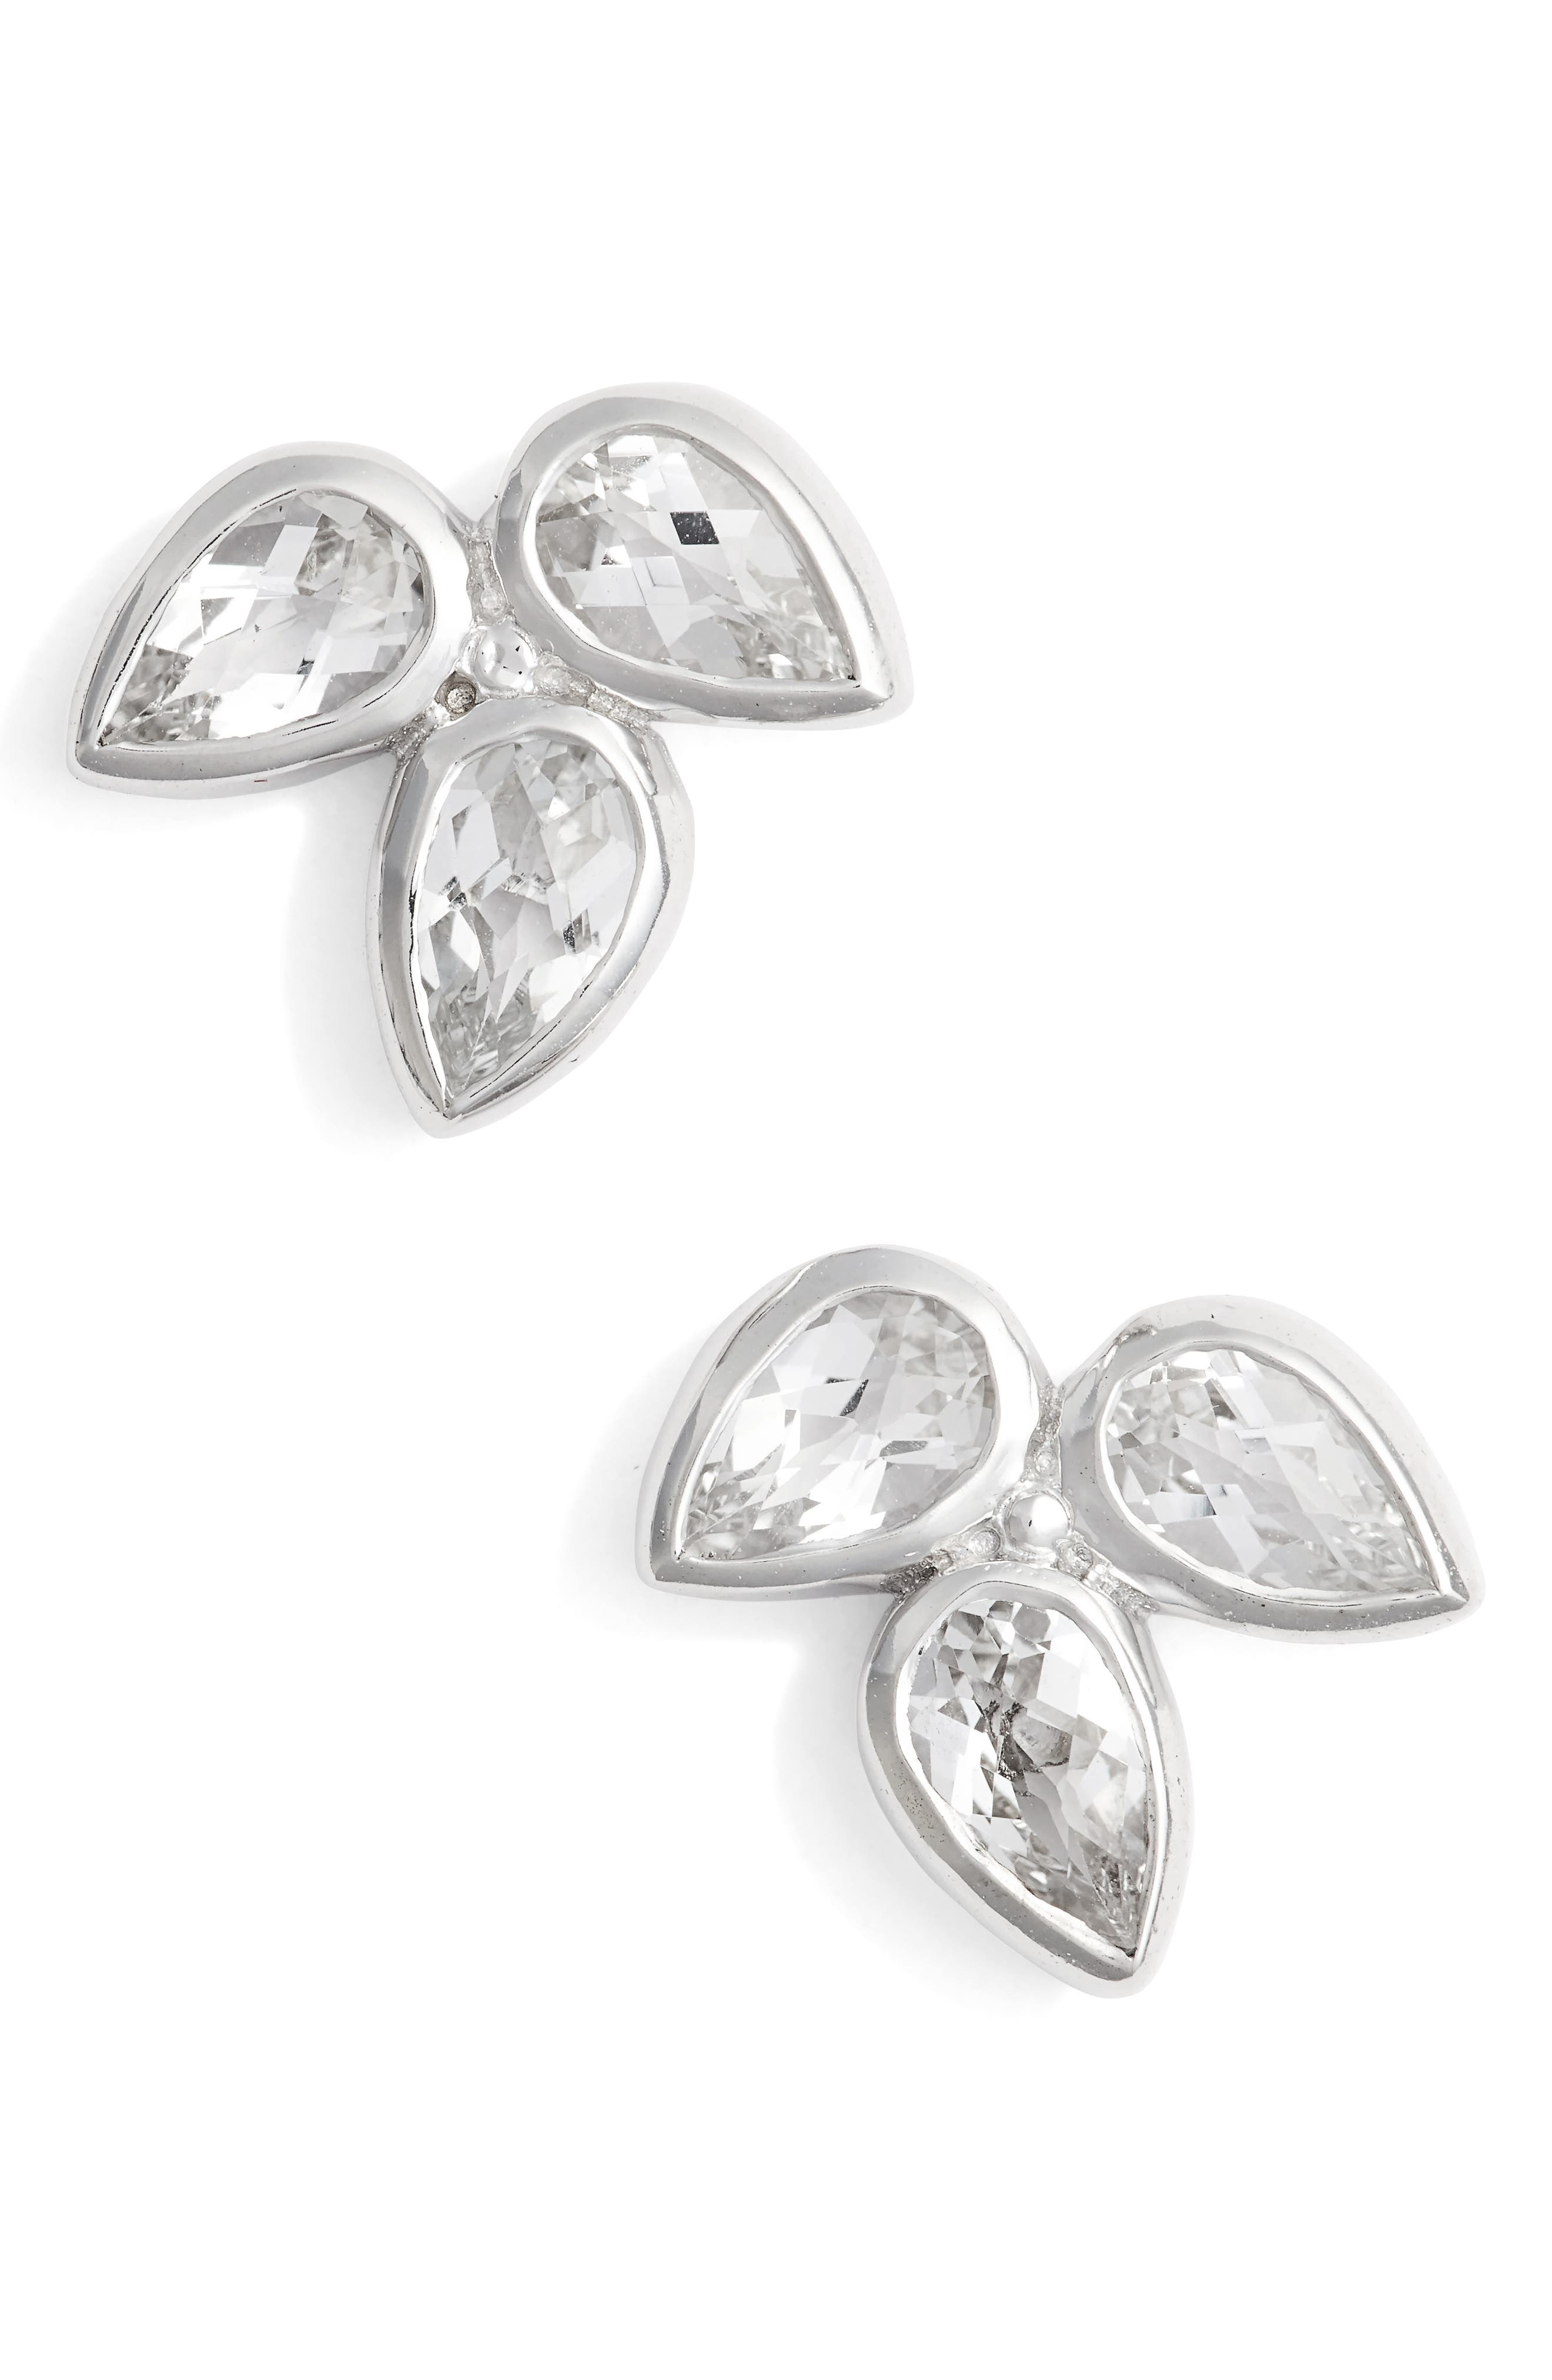 Micro Bouquet White Topaz Post Earrings,                             Main thumbnail 1, color,                             WHITE TOPAZ